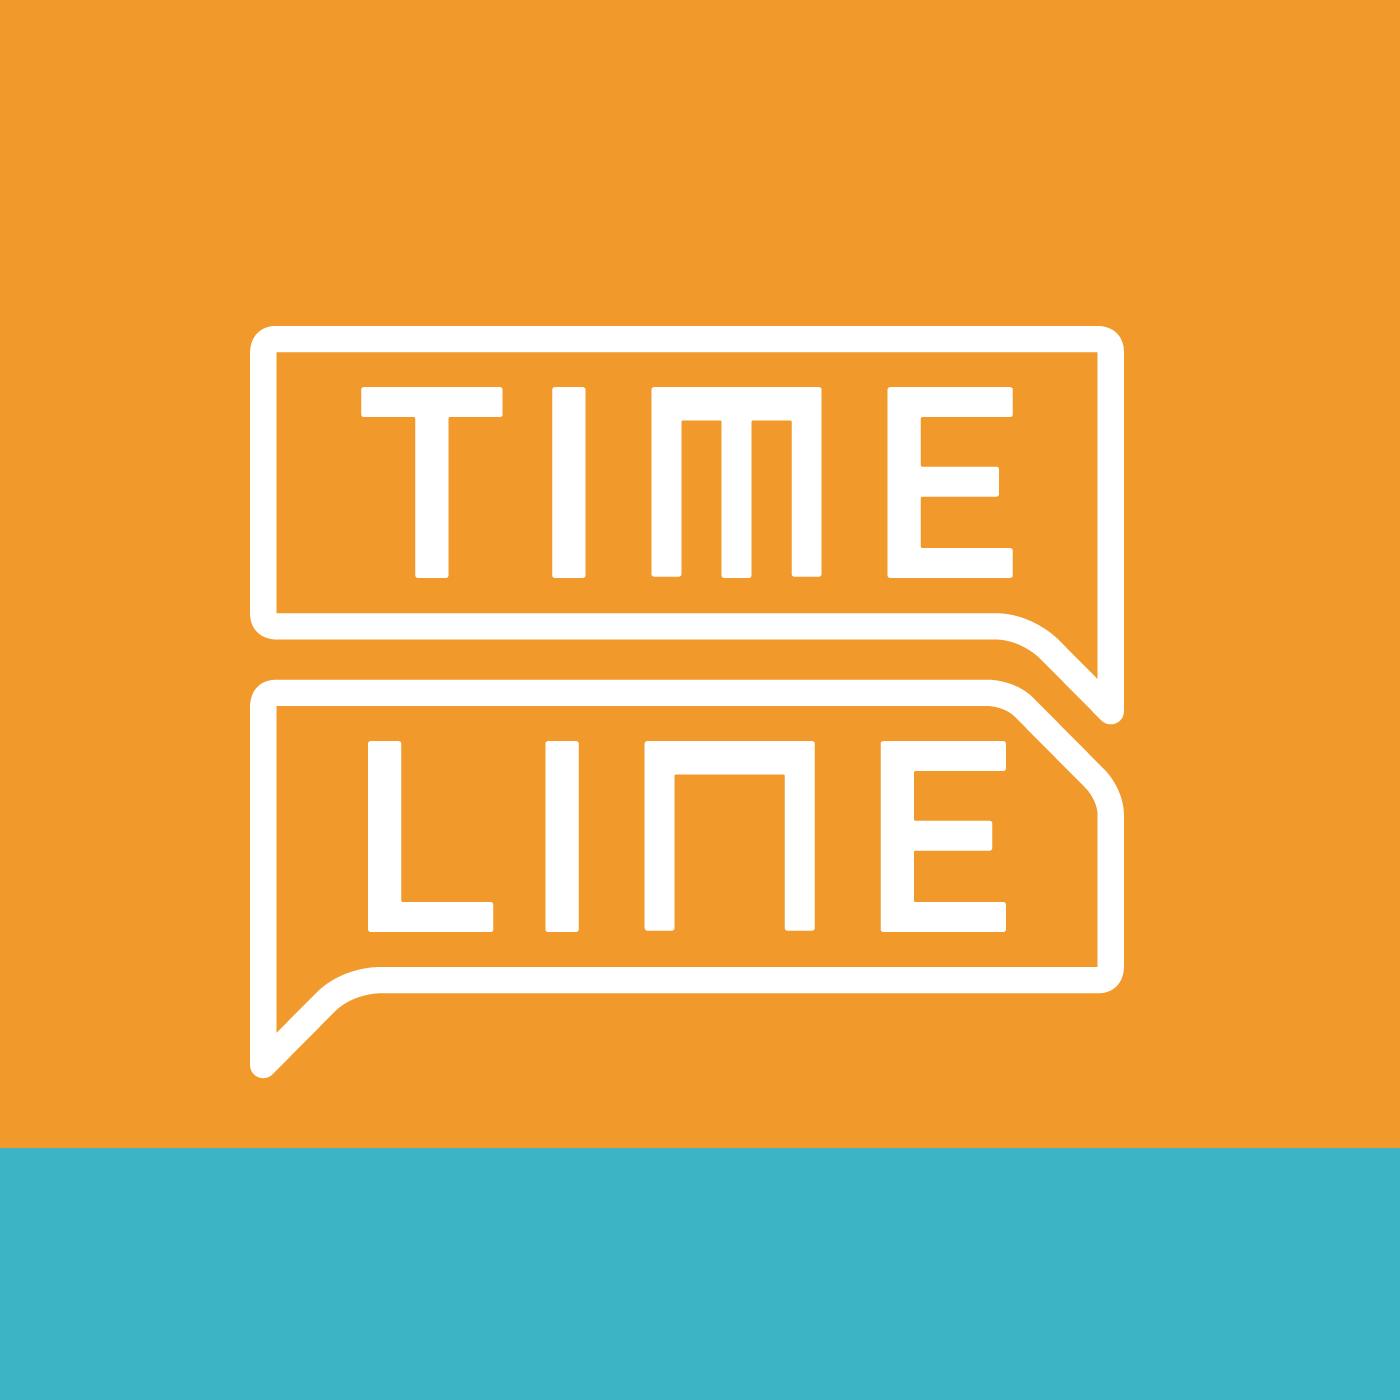 Timeline Gaúcha 23/03/2017